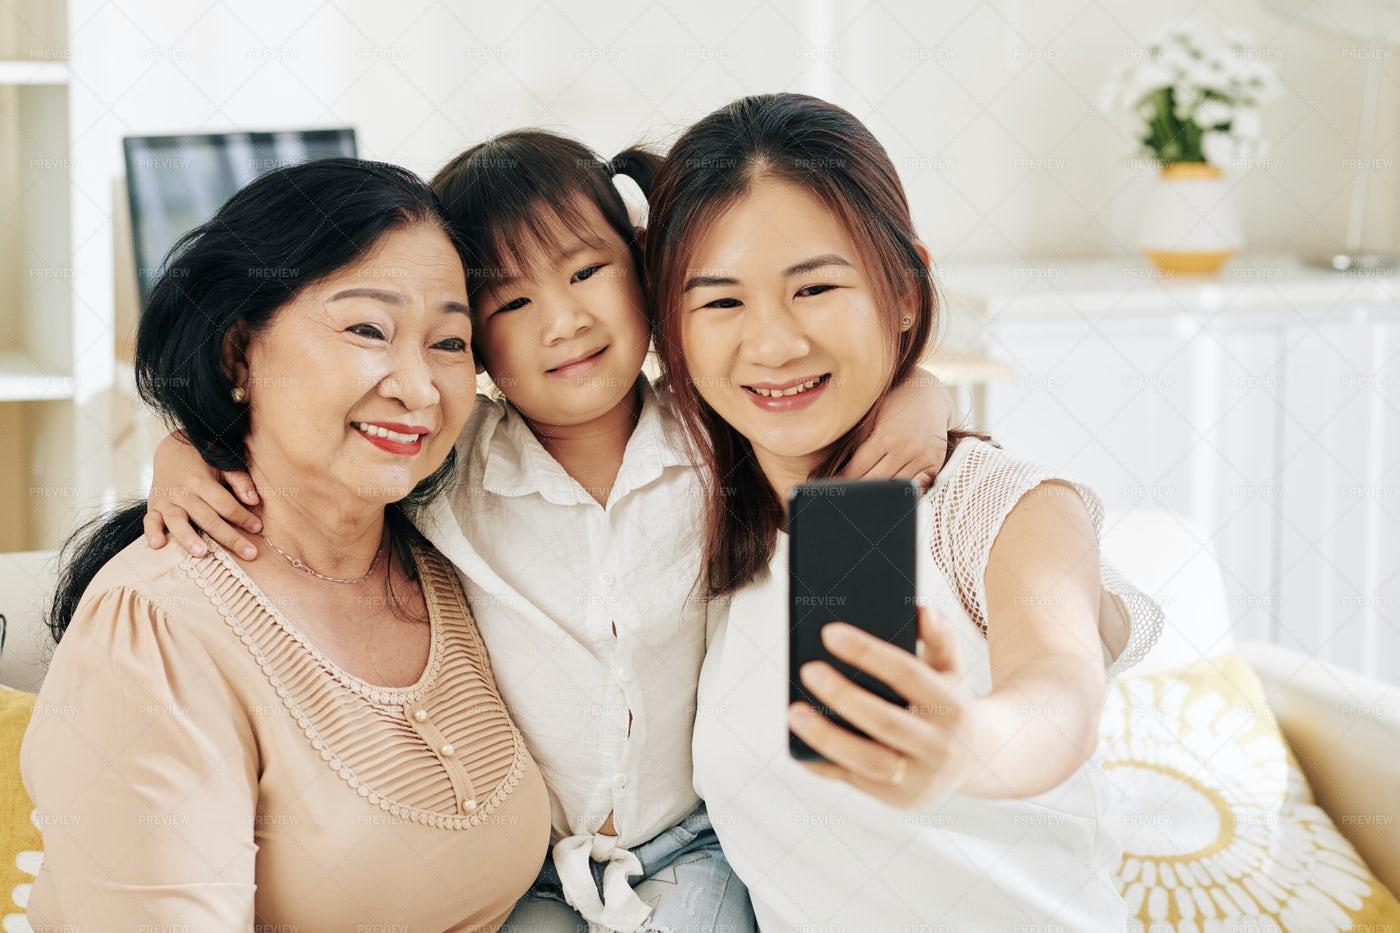 Hugging Family Taking Selfie: Stock Photos